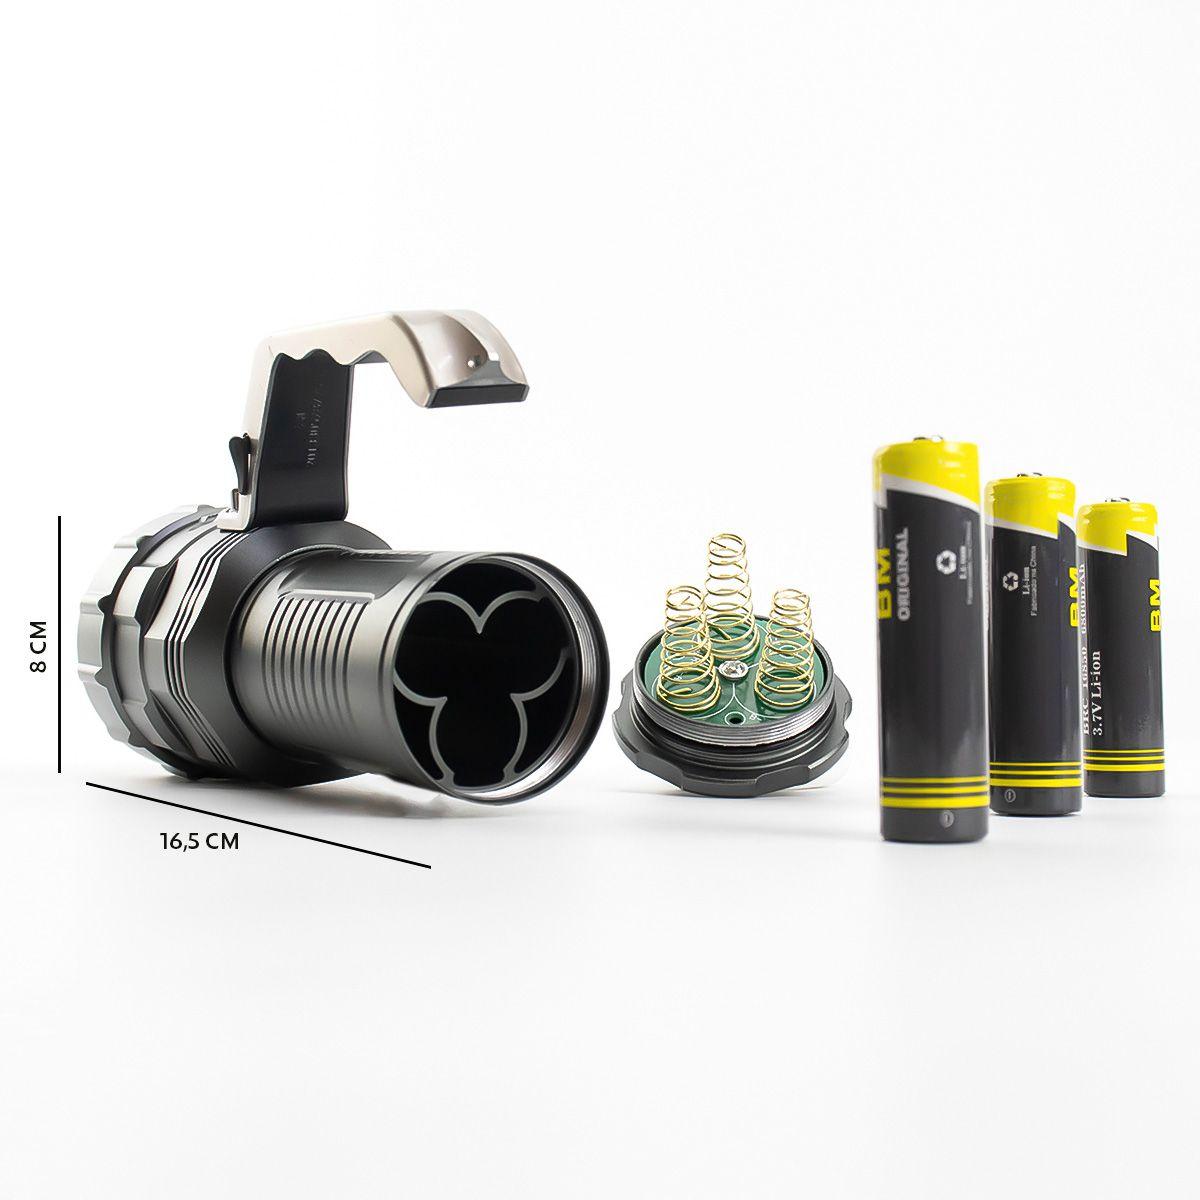 KIT Lanterna Led Recarregável BM-8806 + Mini Lanterna Tática Compacta BM8400